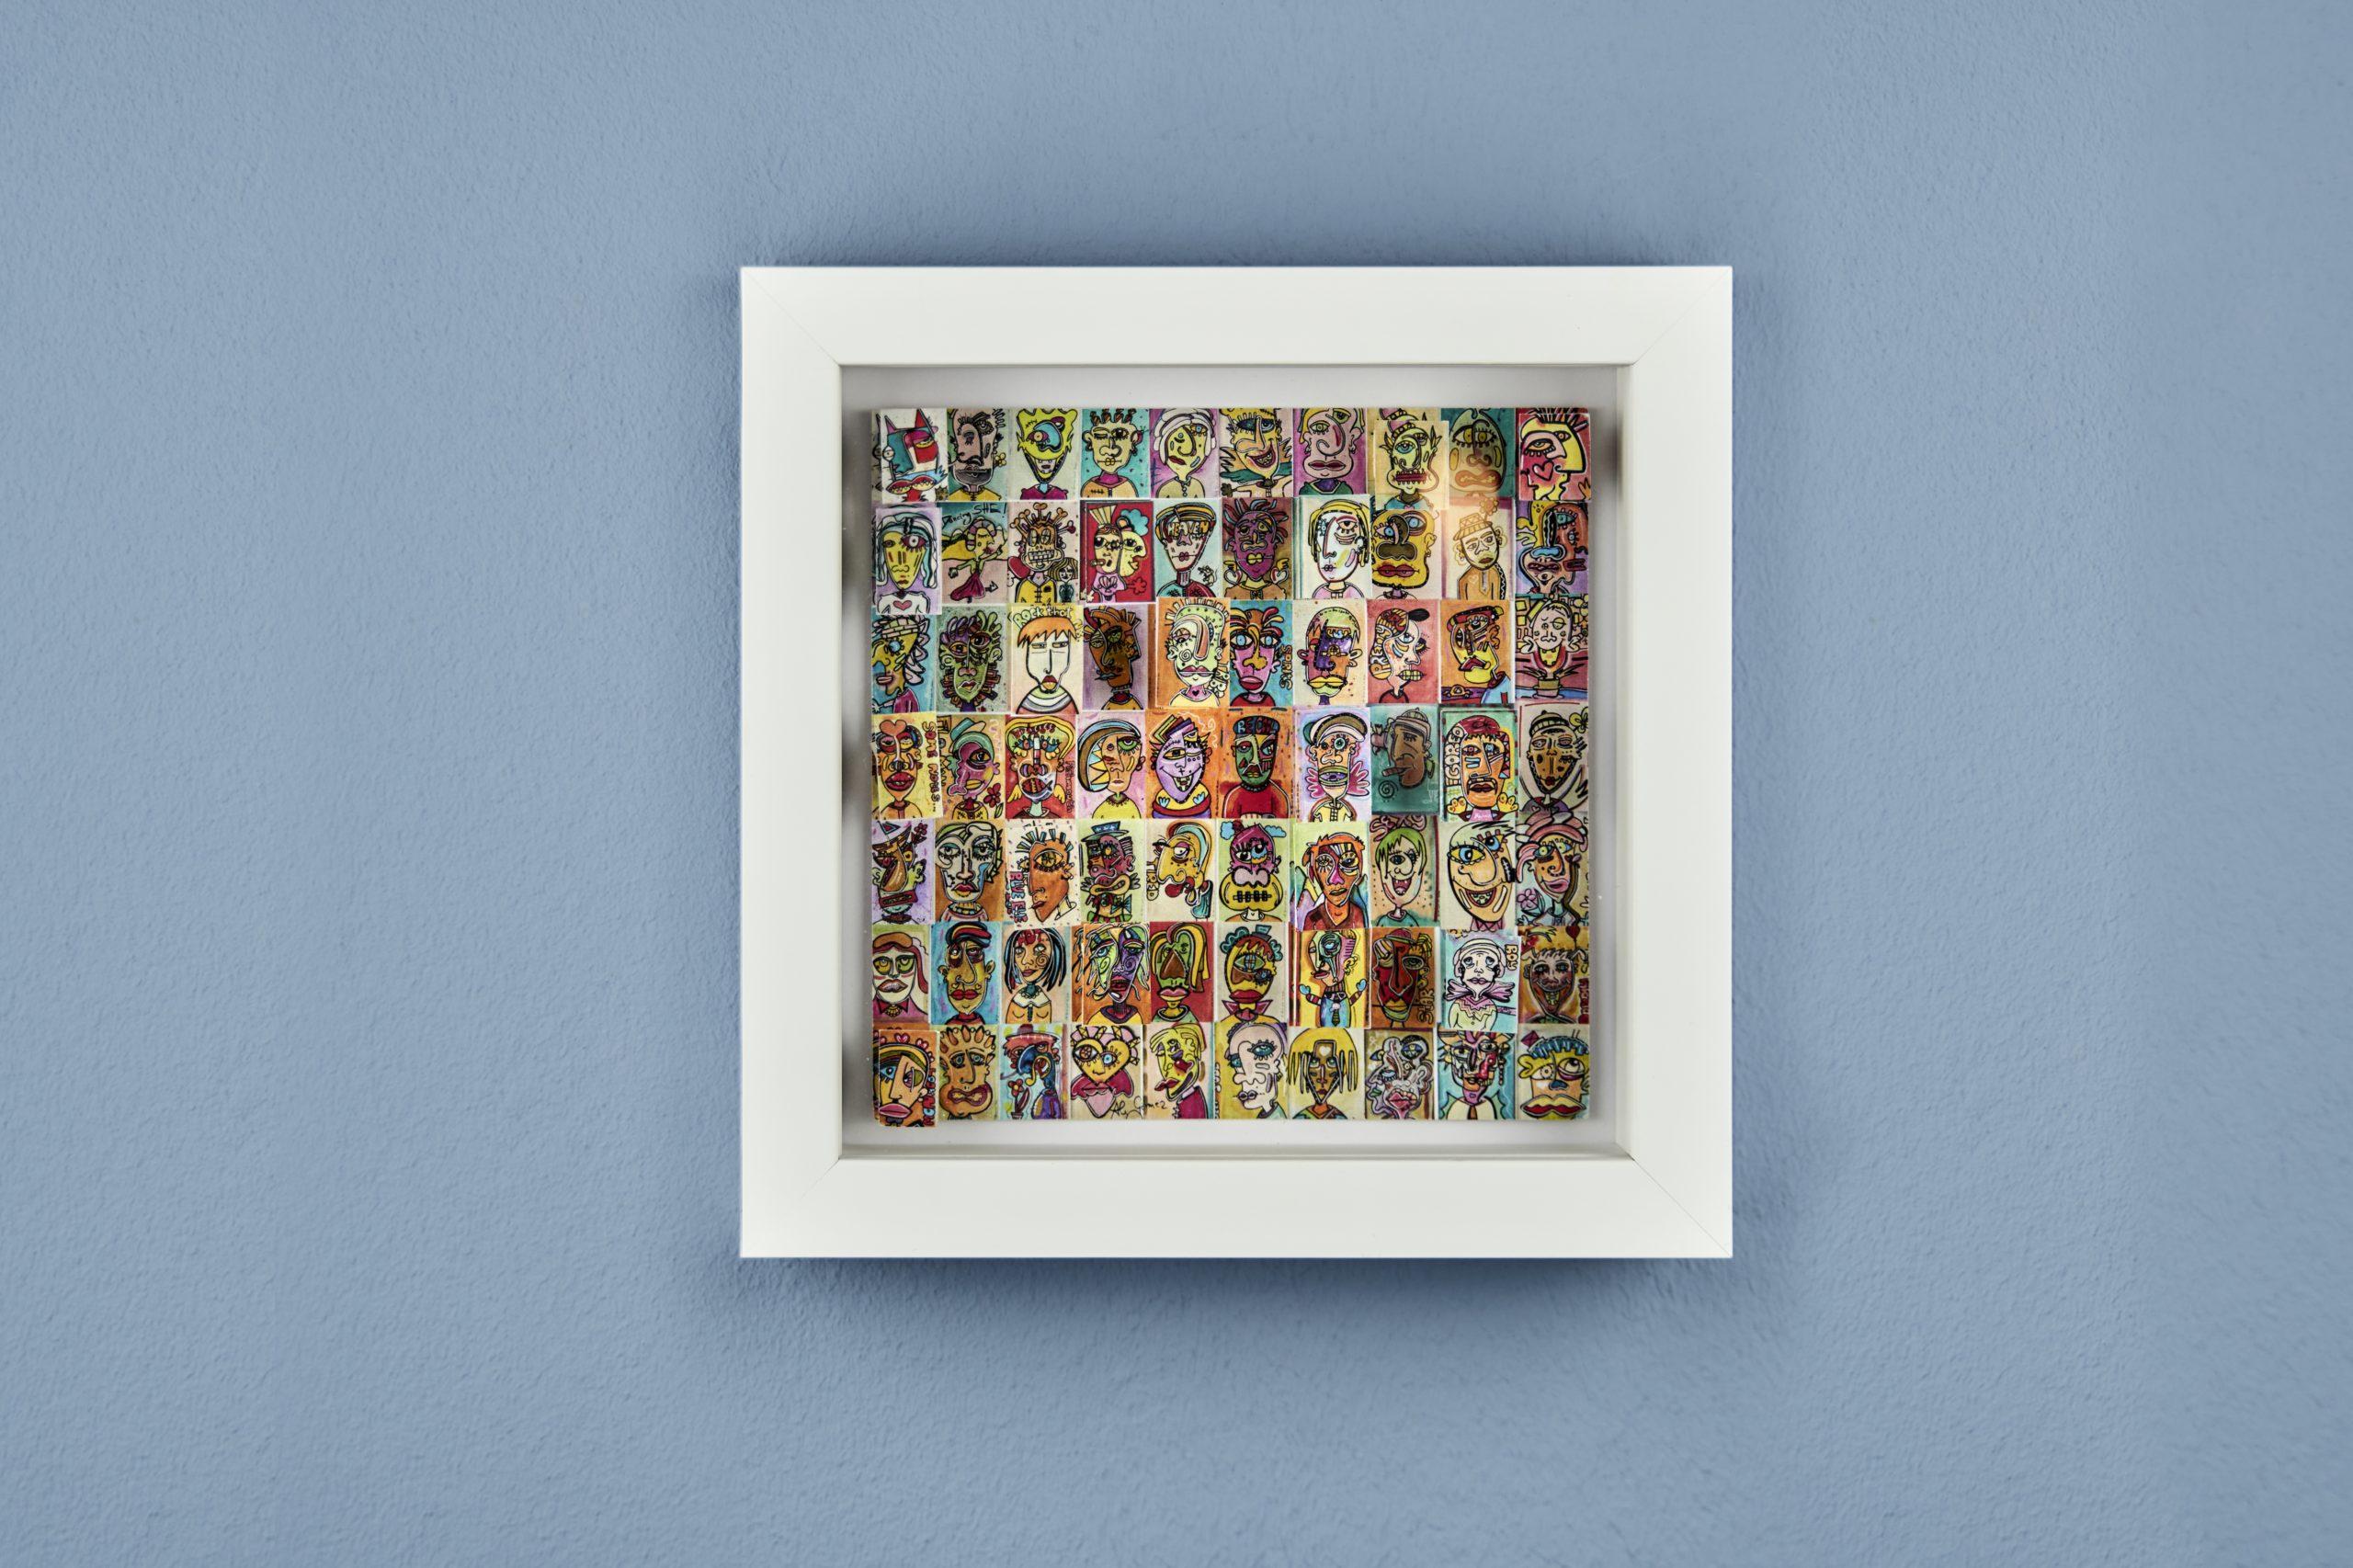 70 of 100 Faces - Pop Art 3D Bild - Ali Görmez Pop Art Berlin